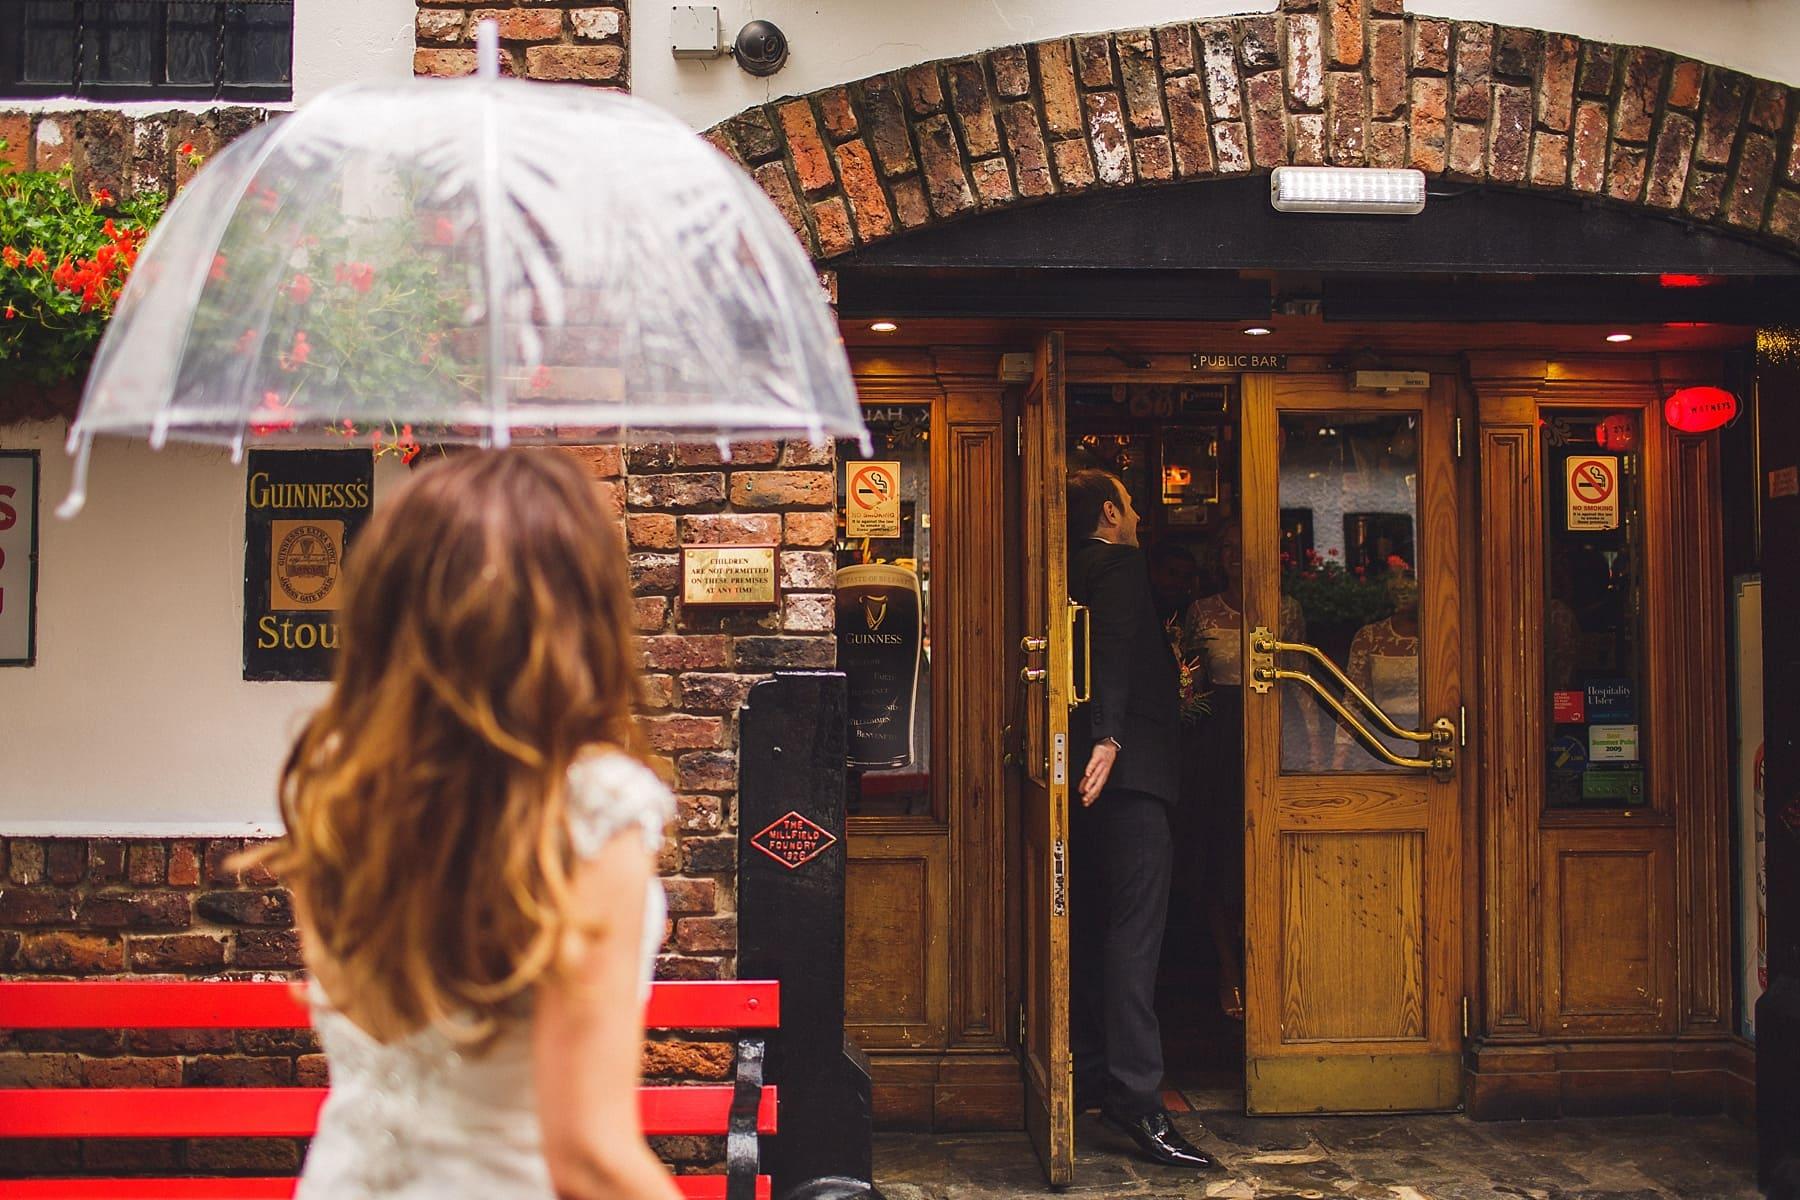 cathedral quarter,belfast wedding photographer,two piece bridesmaids,the flower room,john hewitt bar,first look,